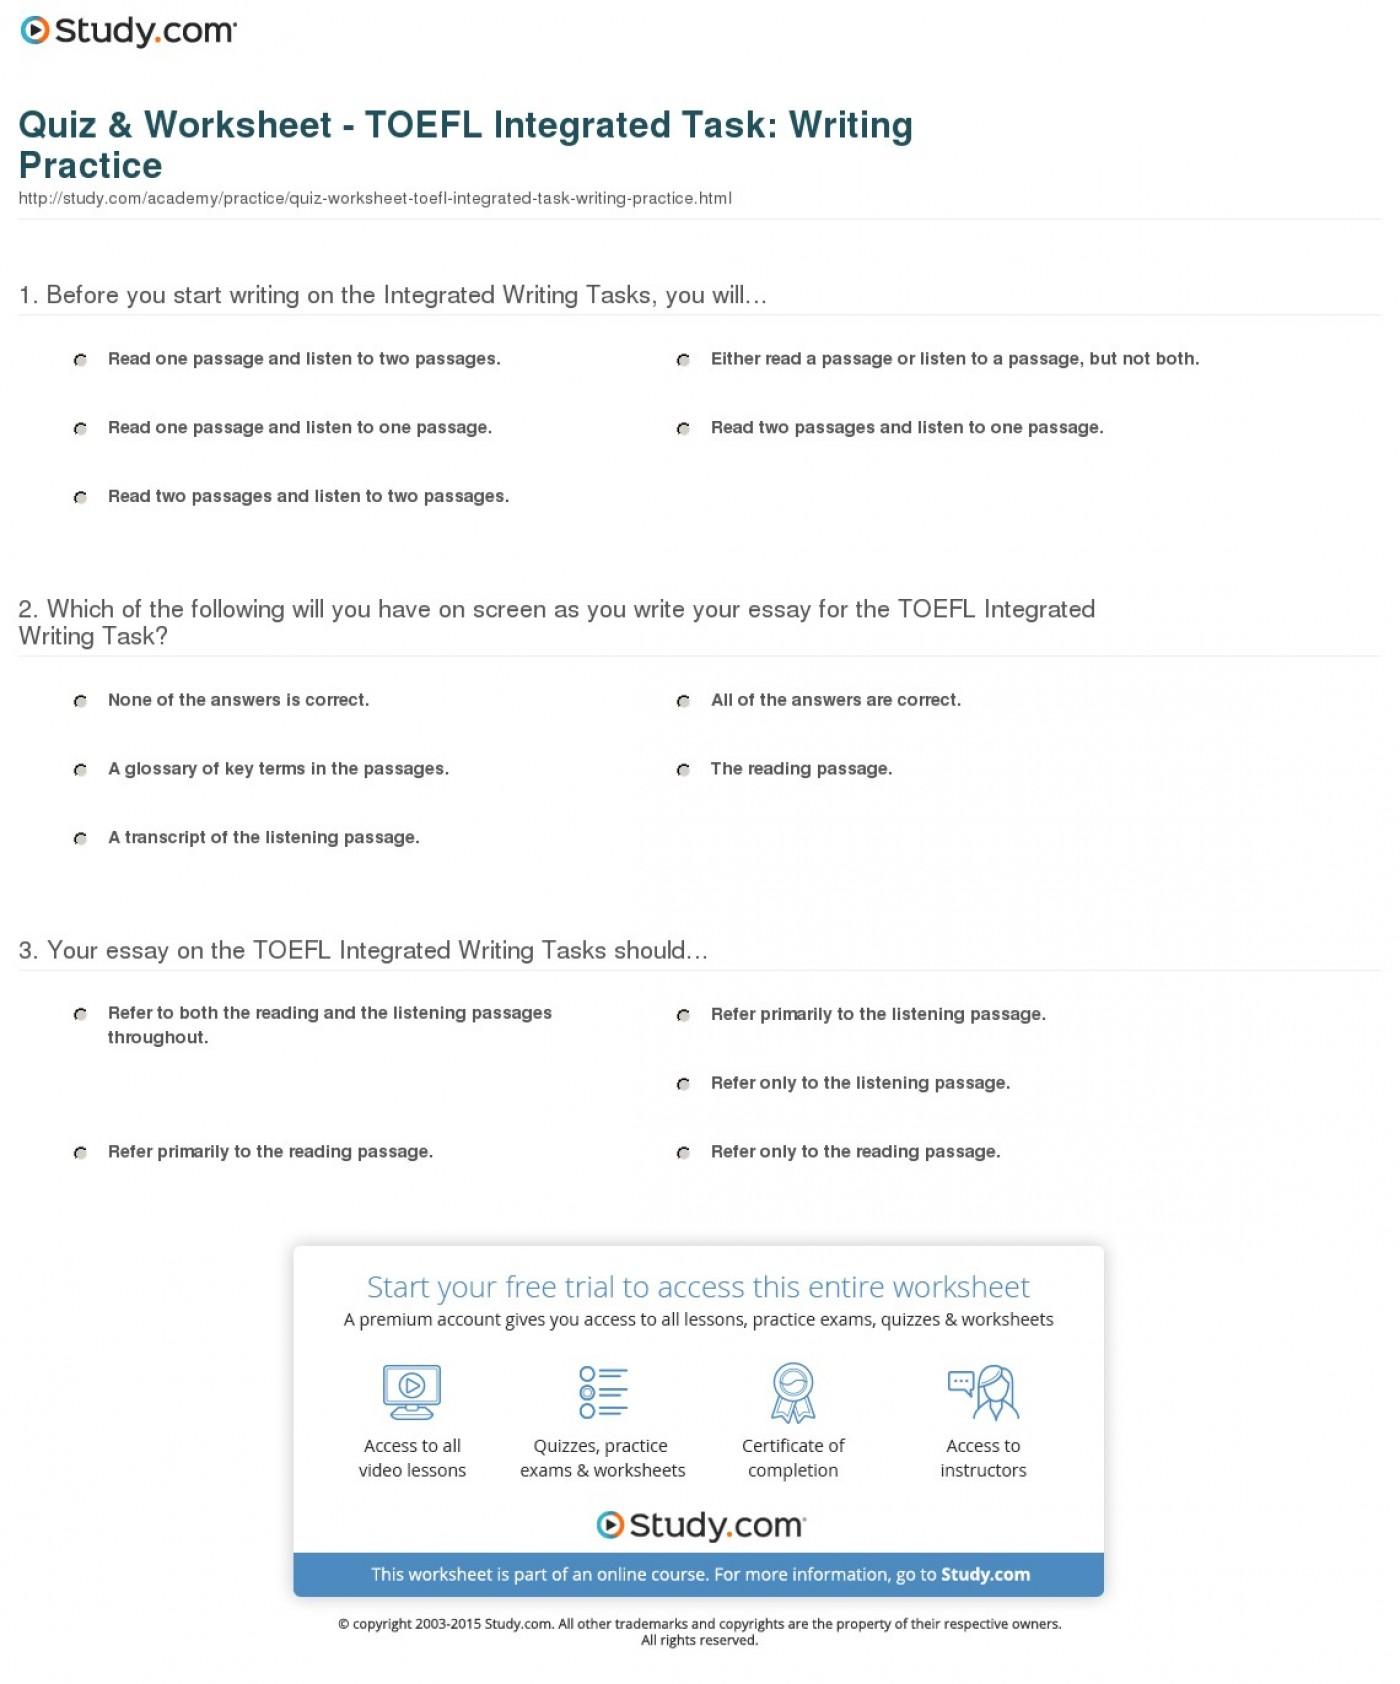 005 Essay Example Quiz Worksheet Toefl Integrated Task Writing Practice Ibt Topics Striking 2015 1400